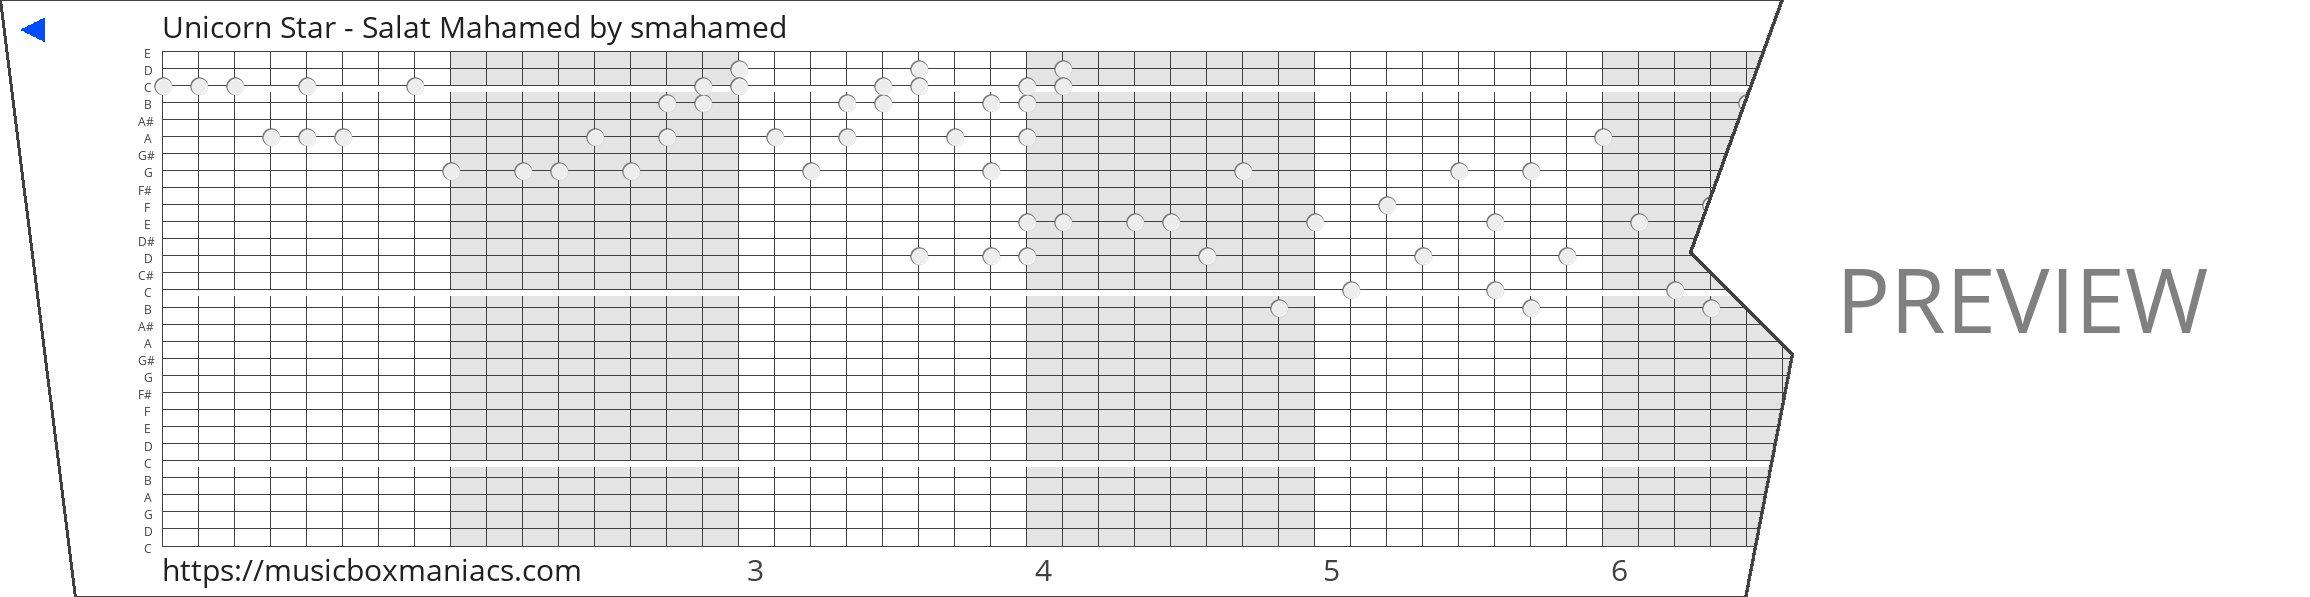 Unicorn Star - Salat Mahamed 30 note music box paper strip